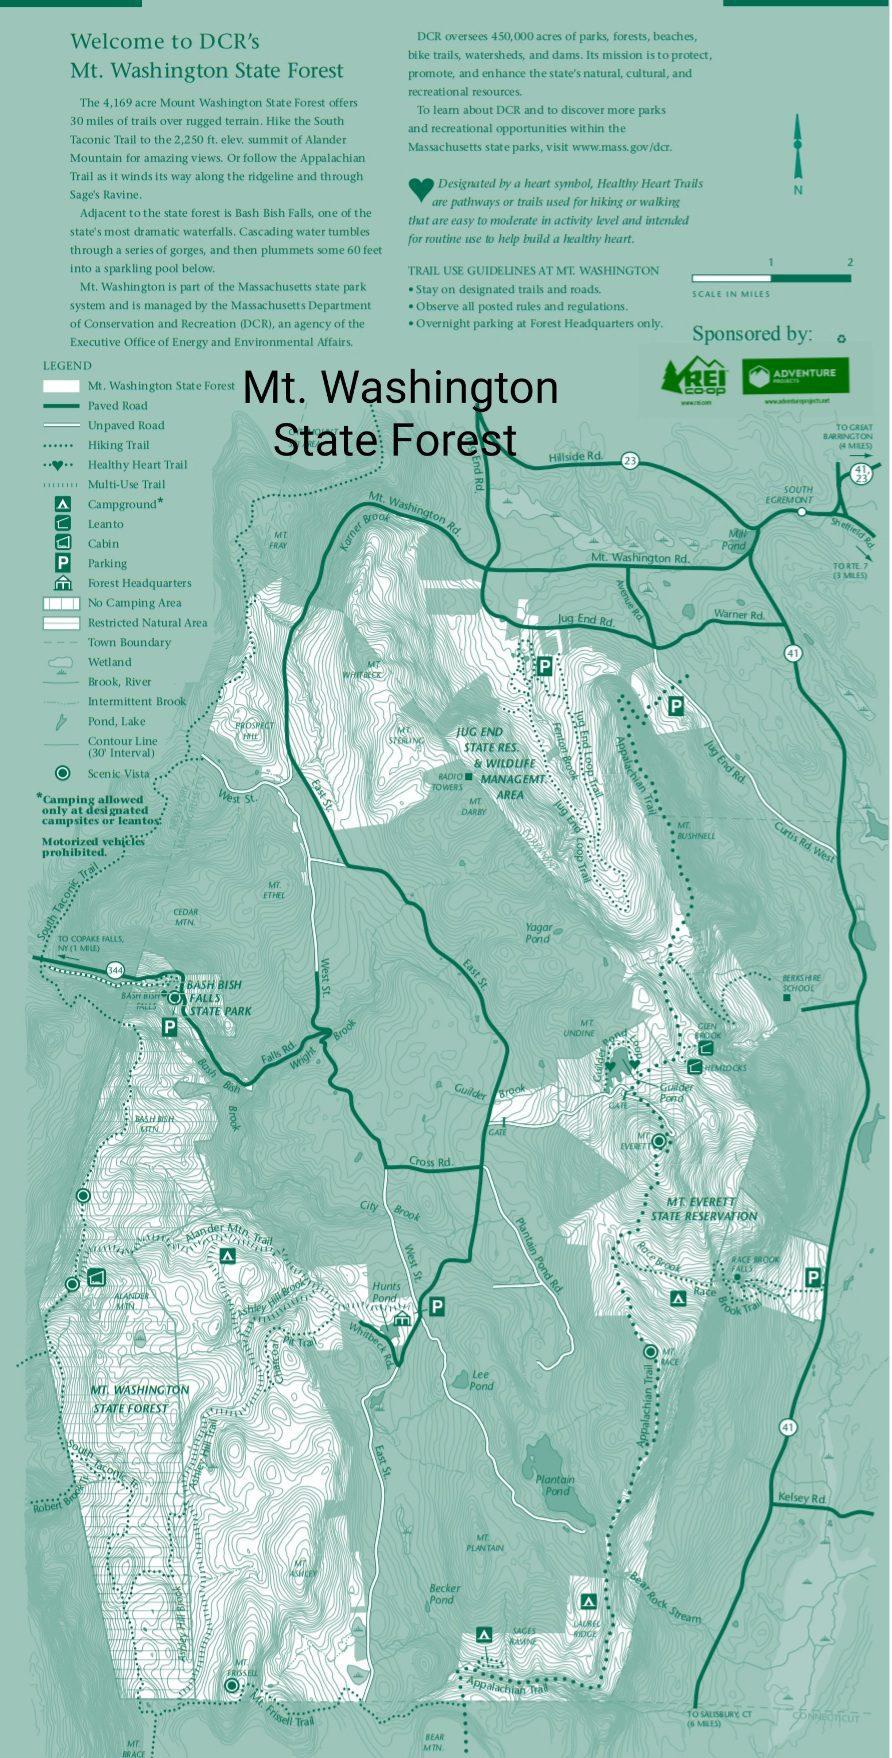 Mt Washington State Forest enlarged